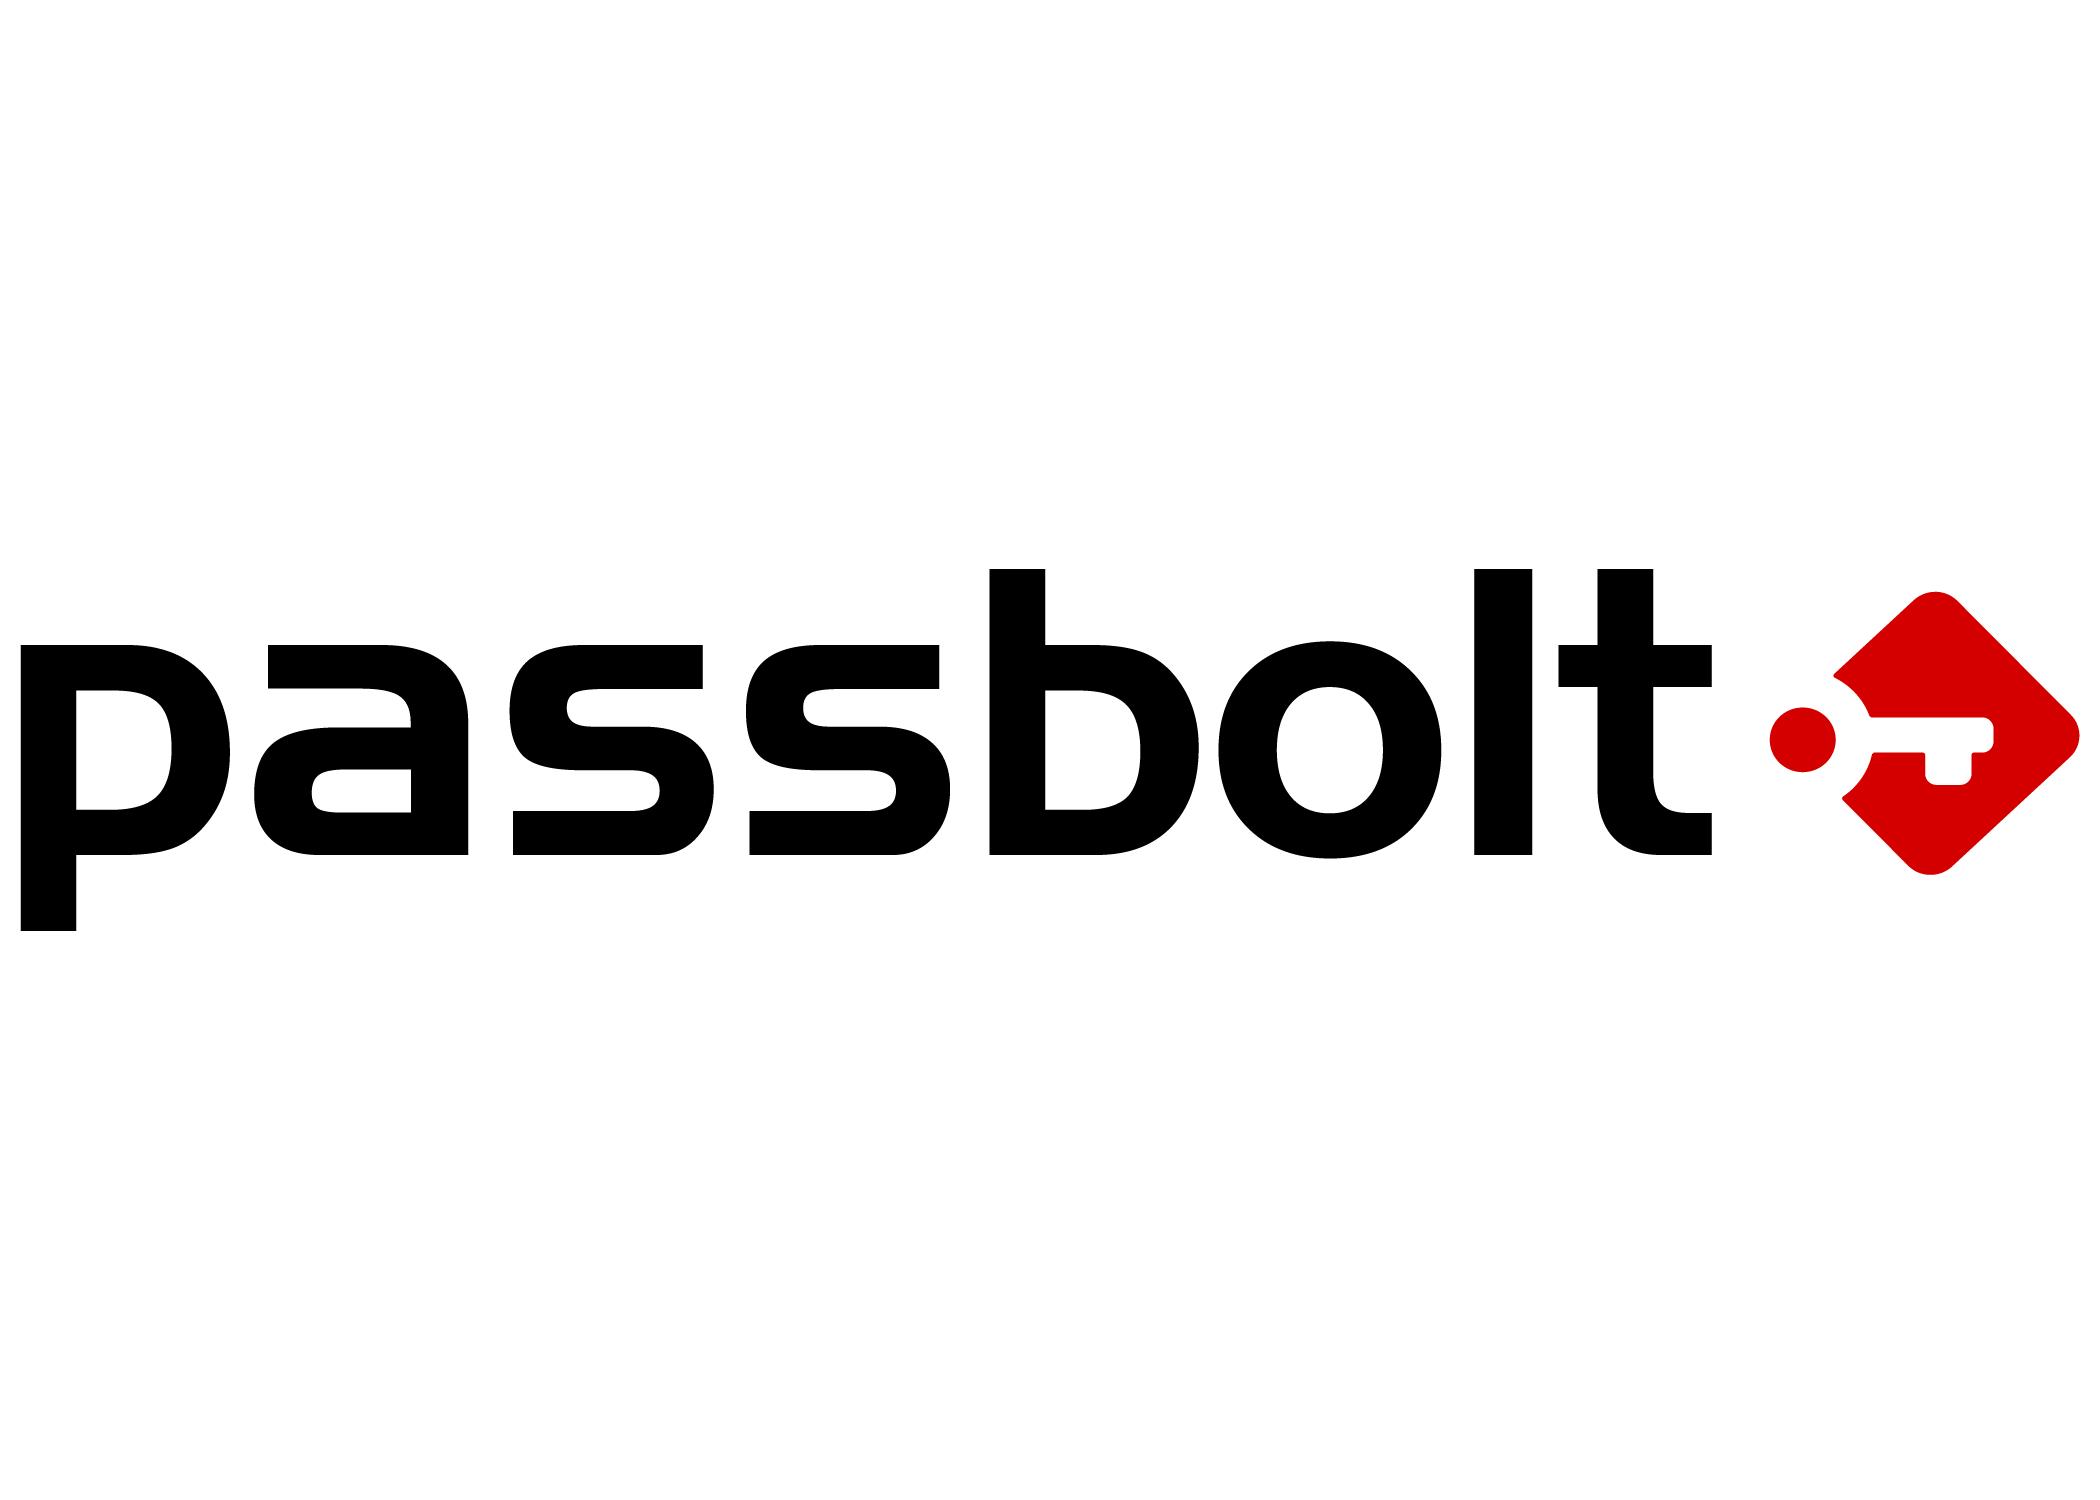 Passbolt-logo